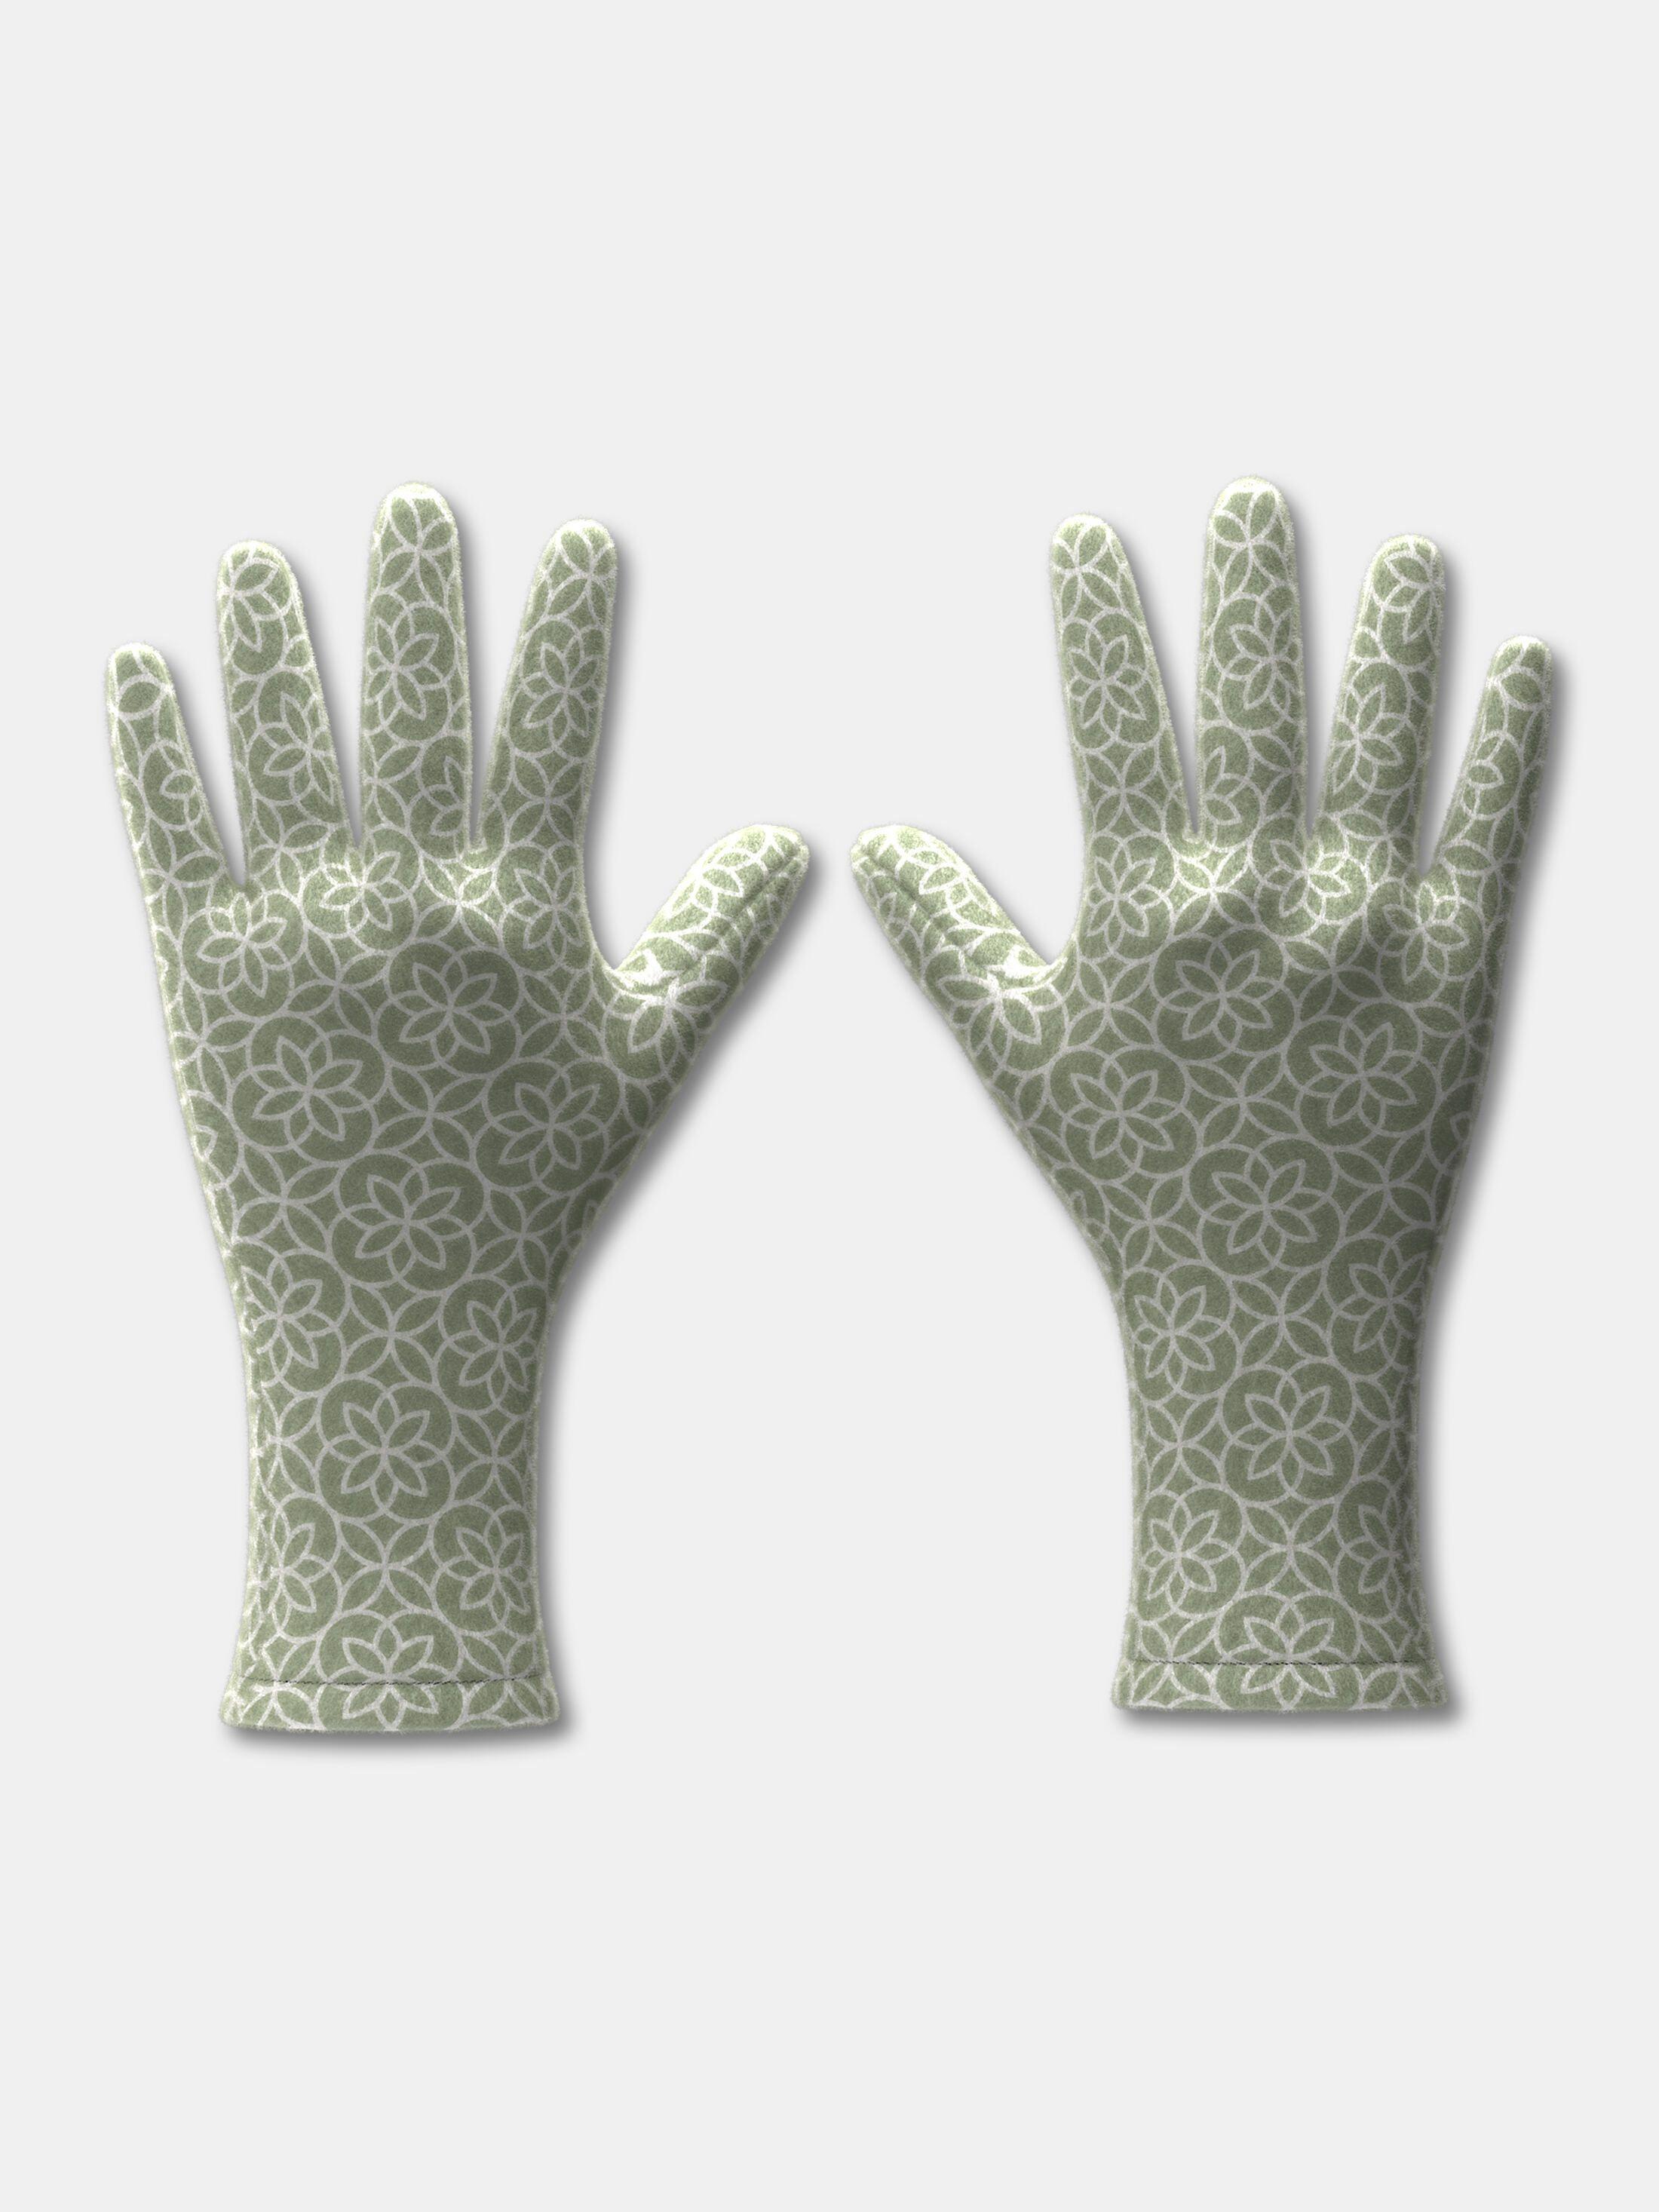 Warme Handschuhe selbst designen